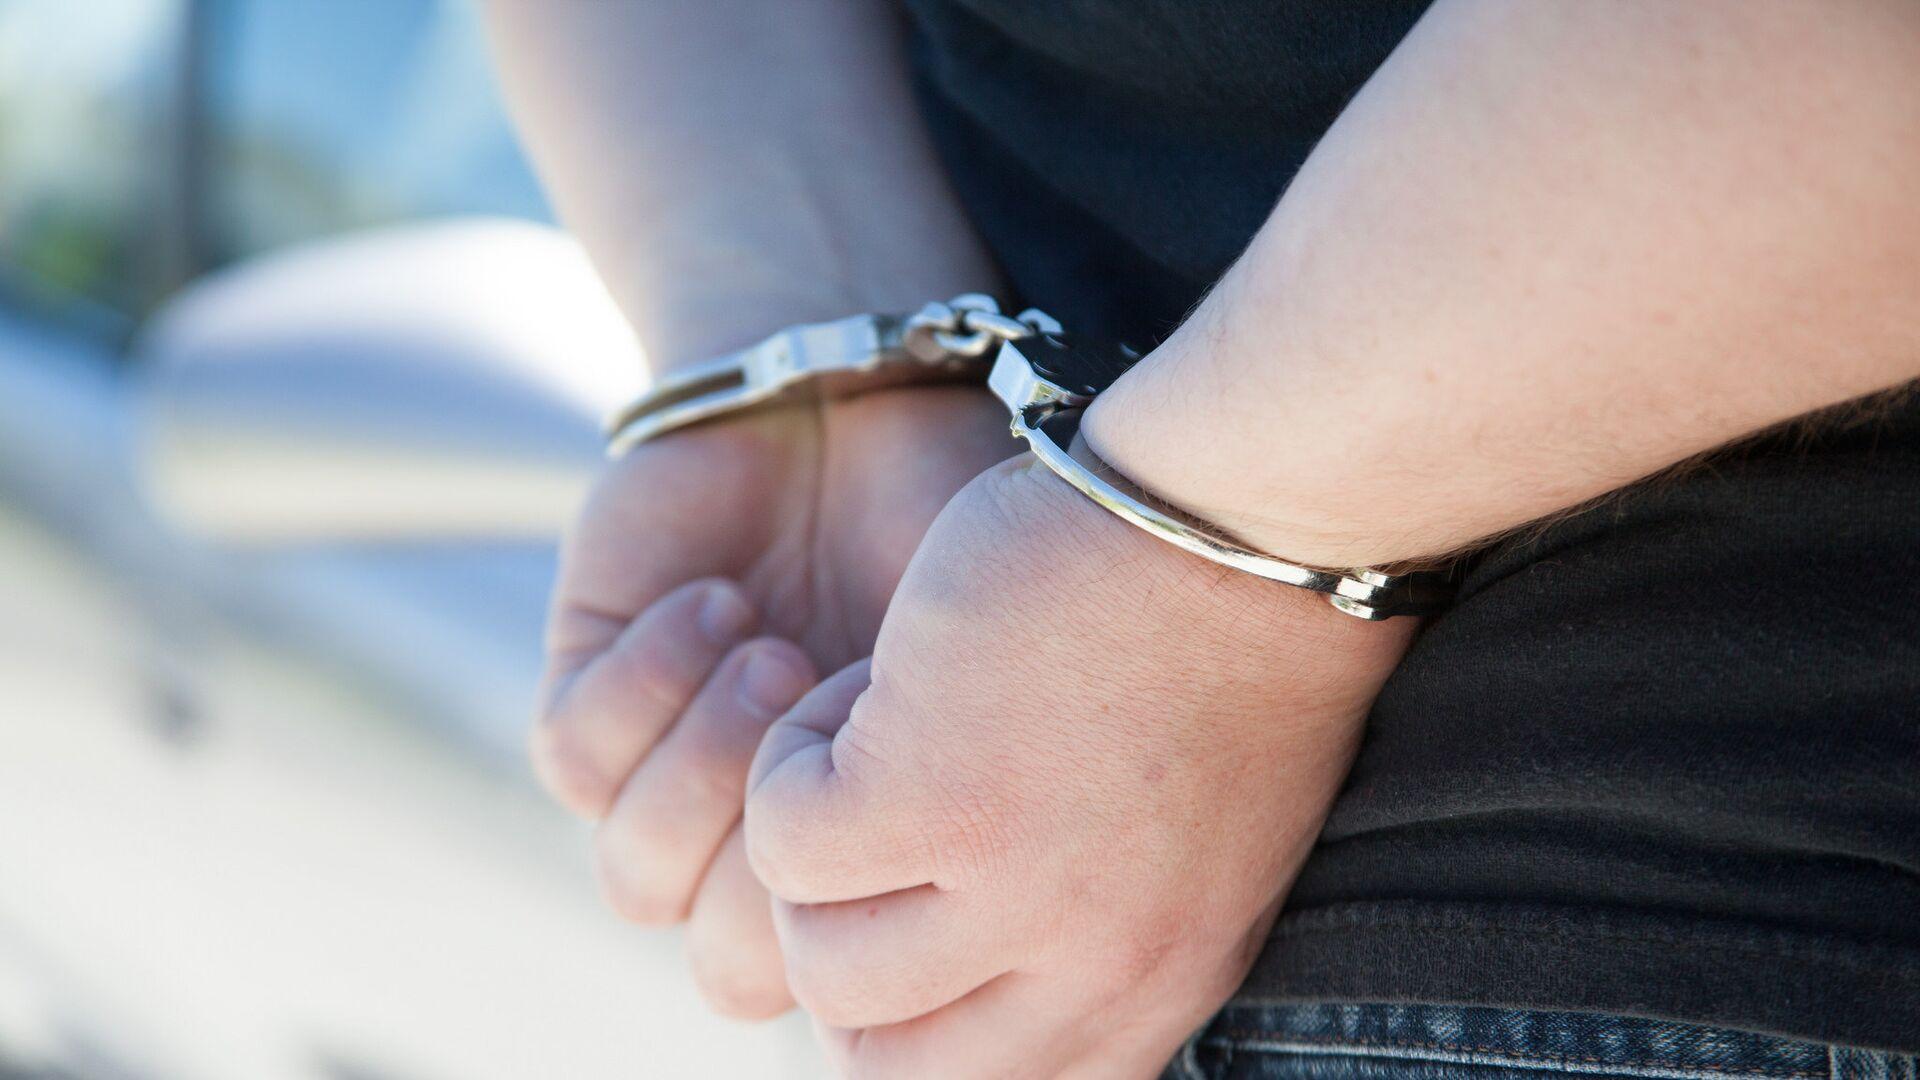 Арестованный в наручниках - Sputnik Արմենիա, 1920, 07.08.2021